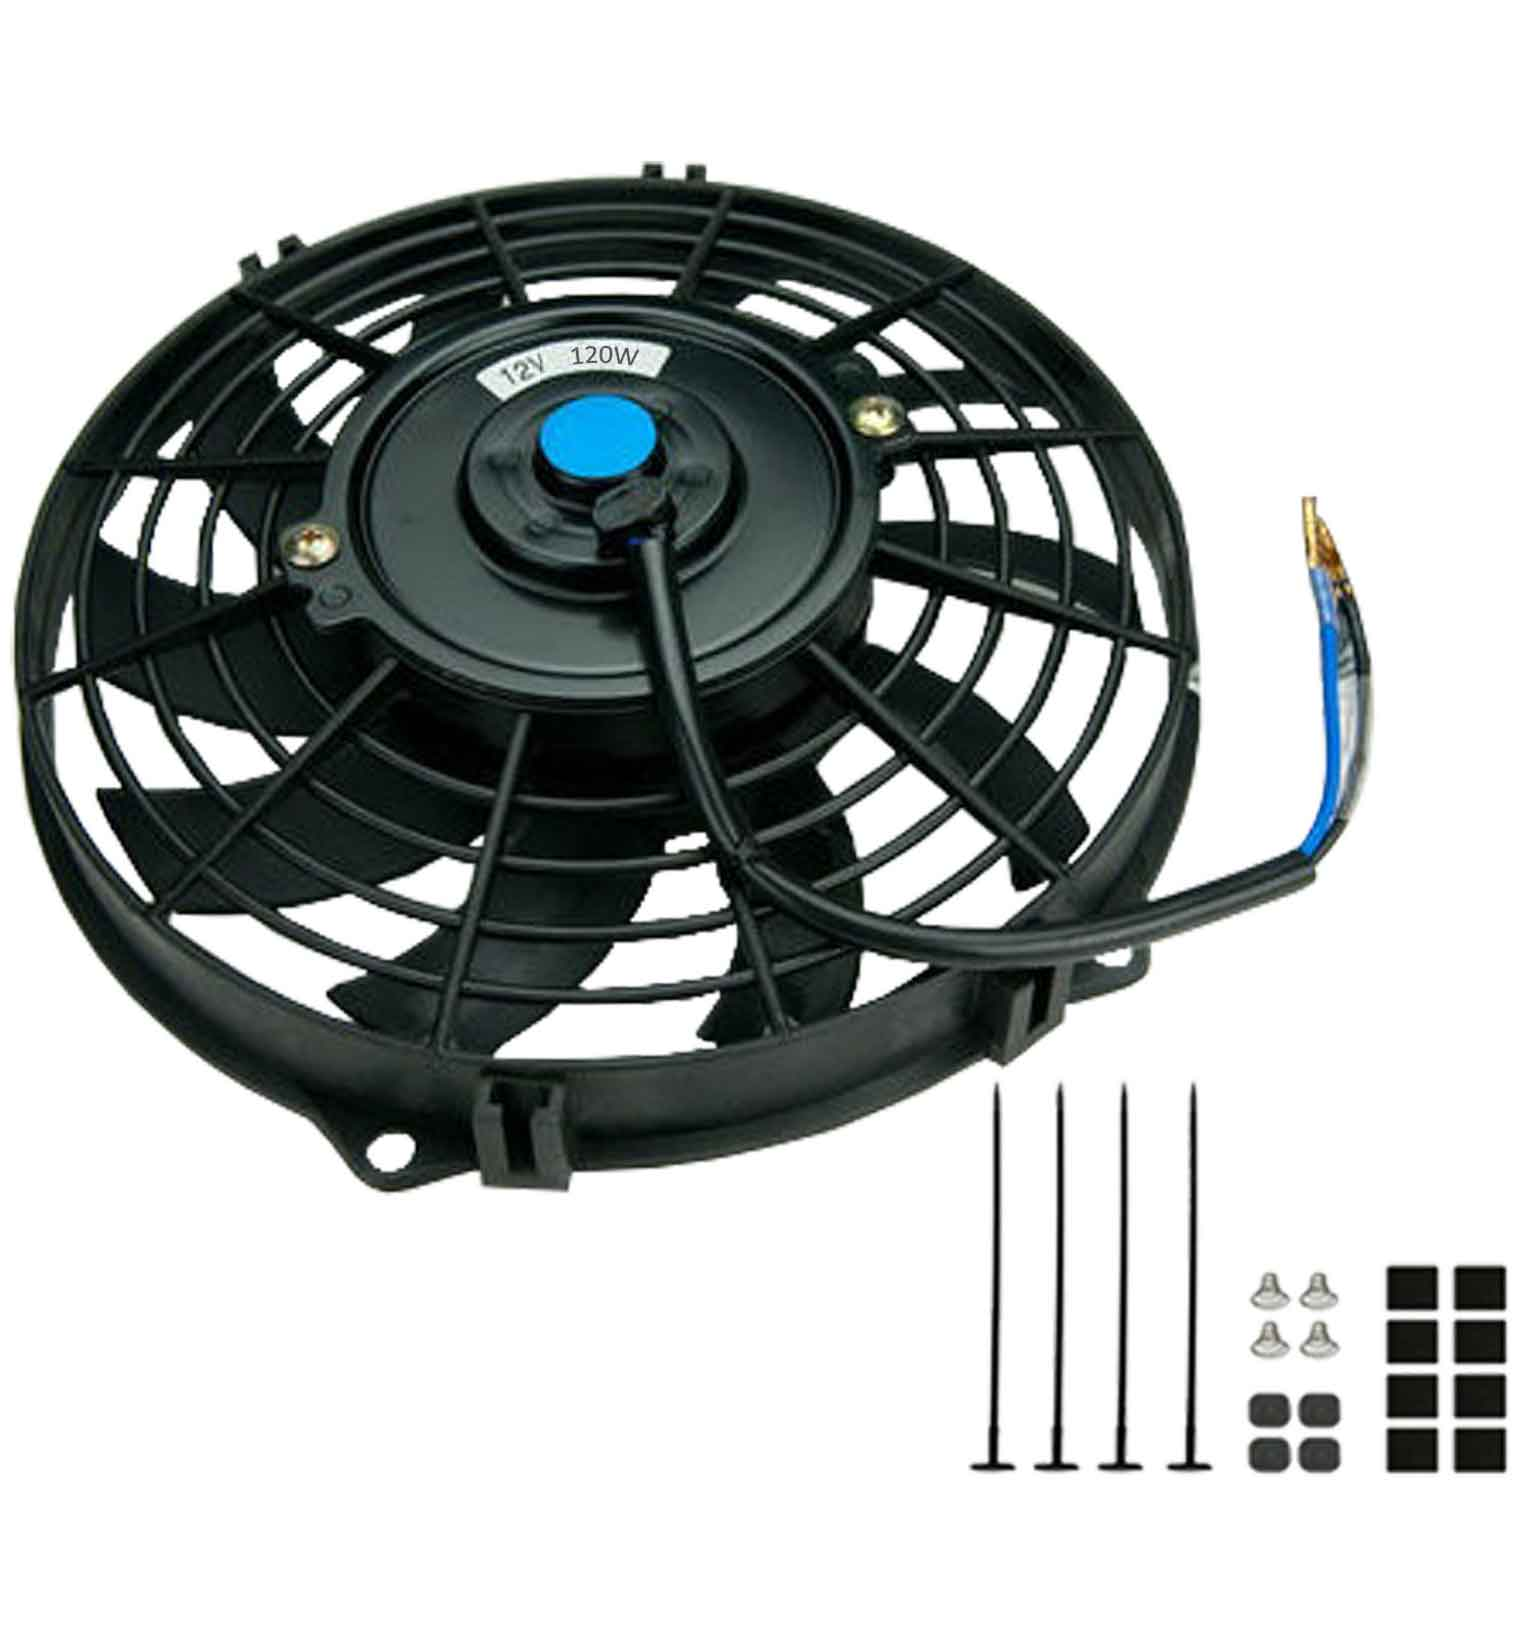 "10"" Universal Slimline Electric Cooling Fan"